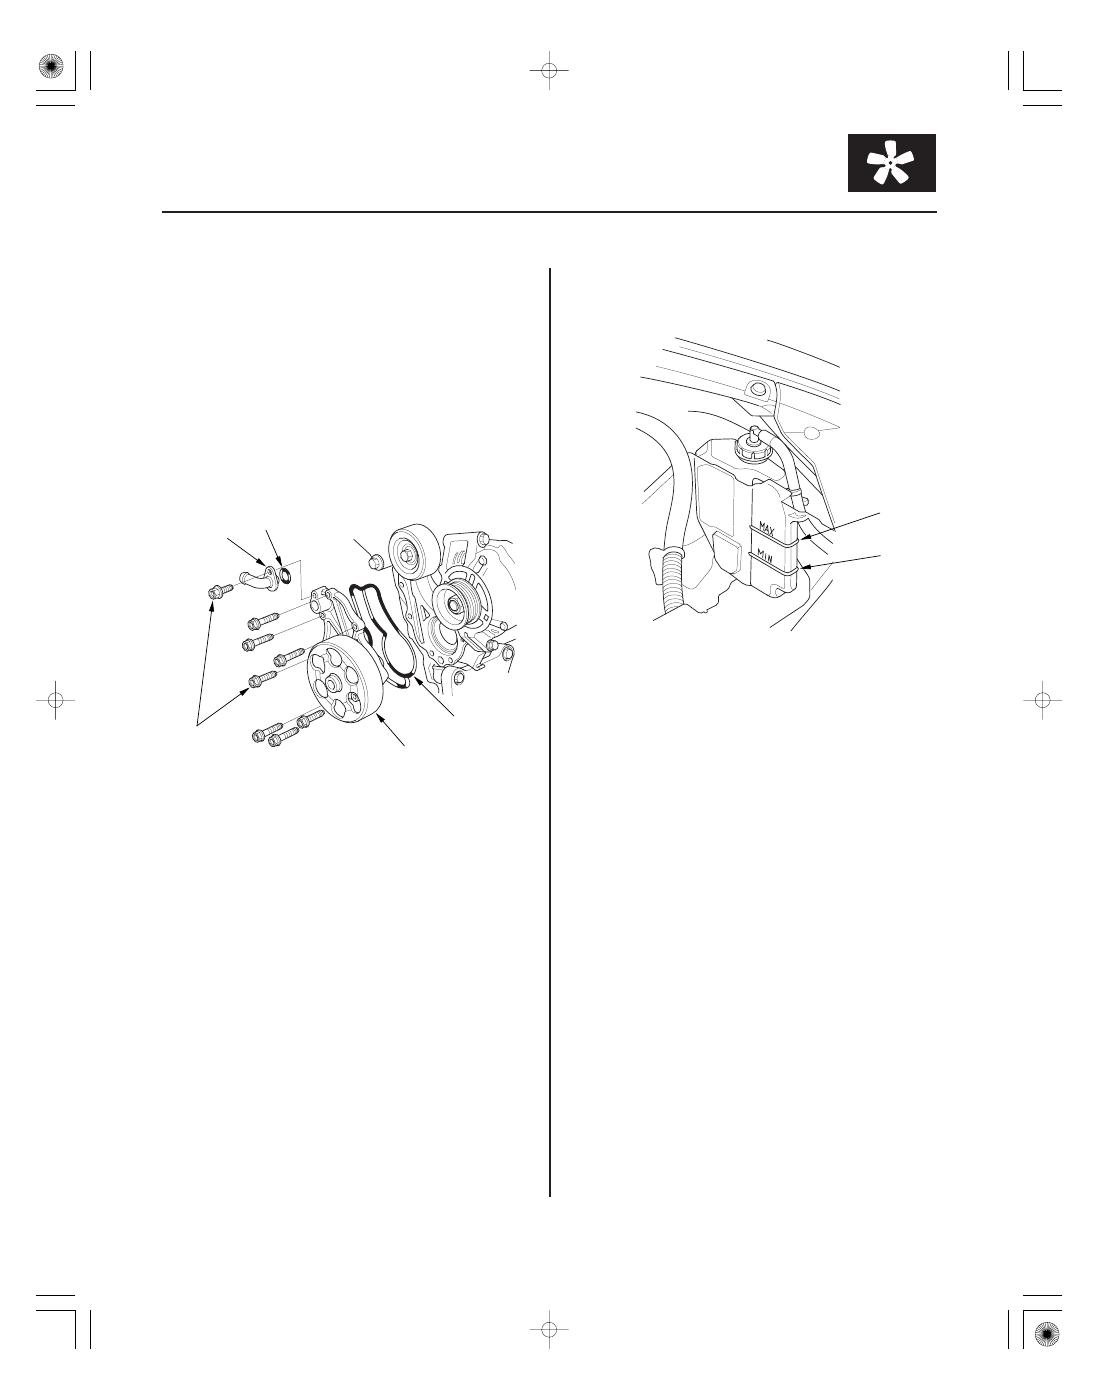 2009 Acura Csx Water Pump Manual Mdx Wiring Schematic 2000 Honda Accord Schematics